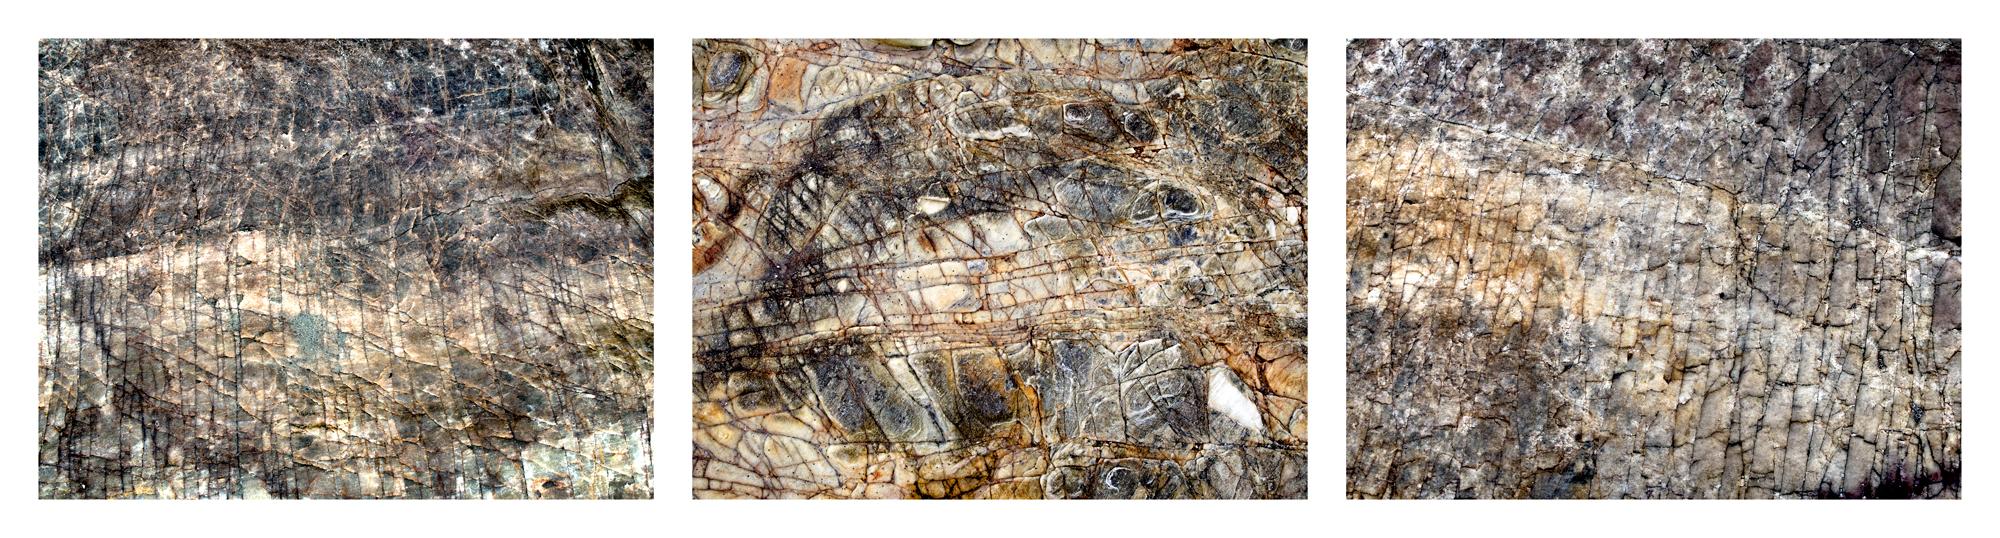 "Sea Writings VI, Ceara Brazil  3 images, 15"" x 20"", 2015"